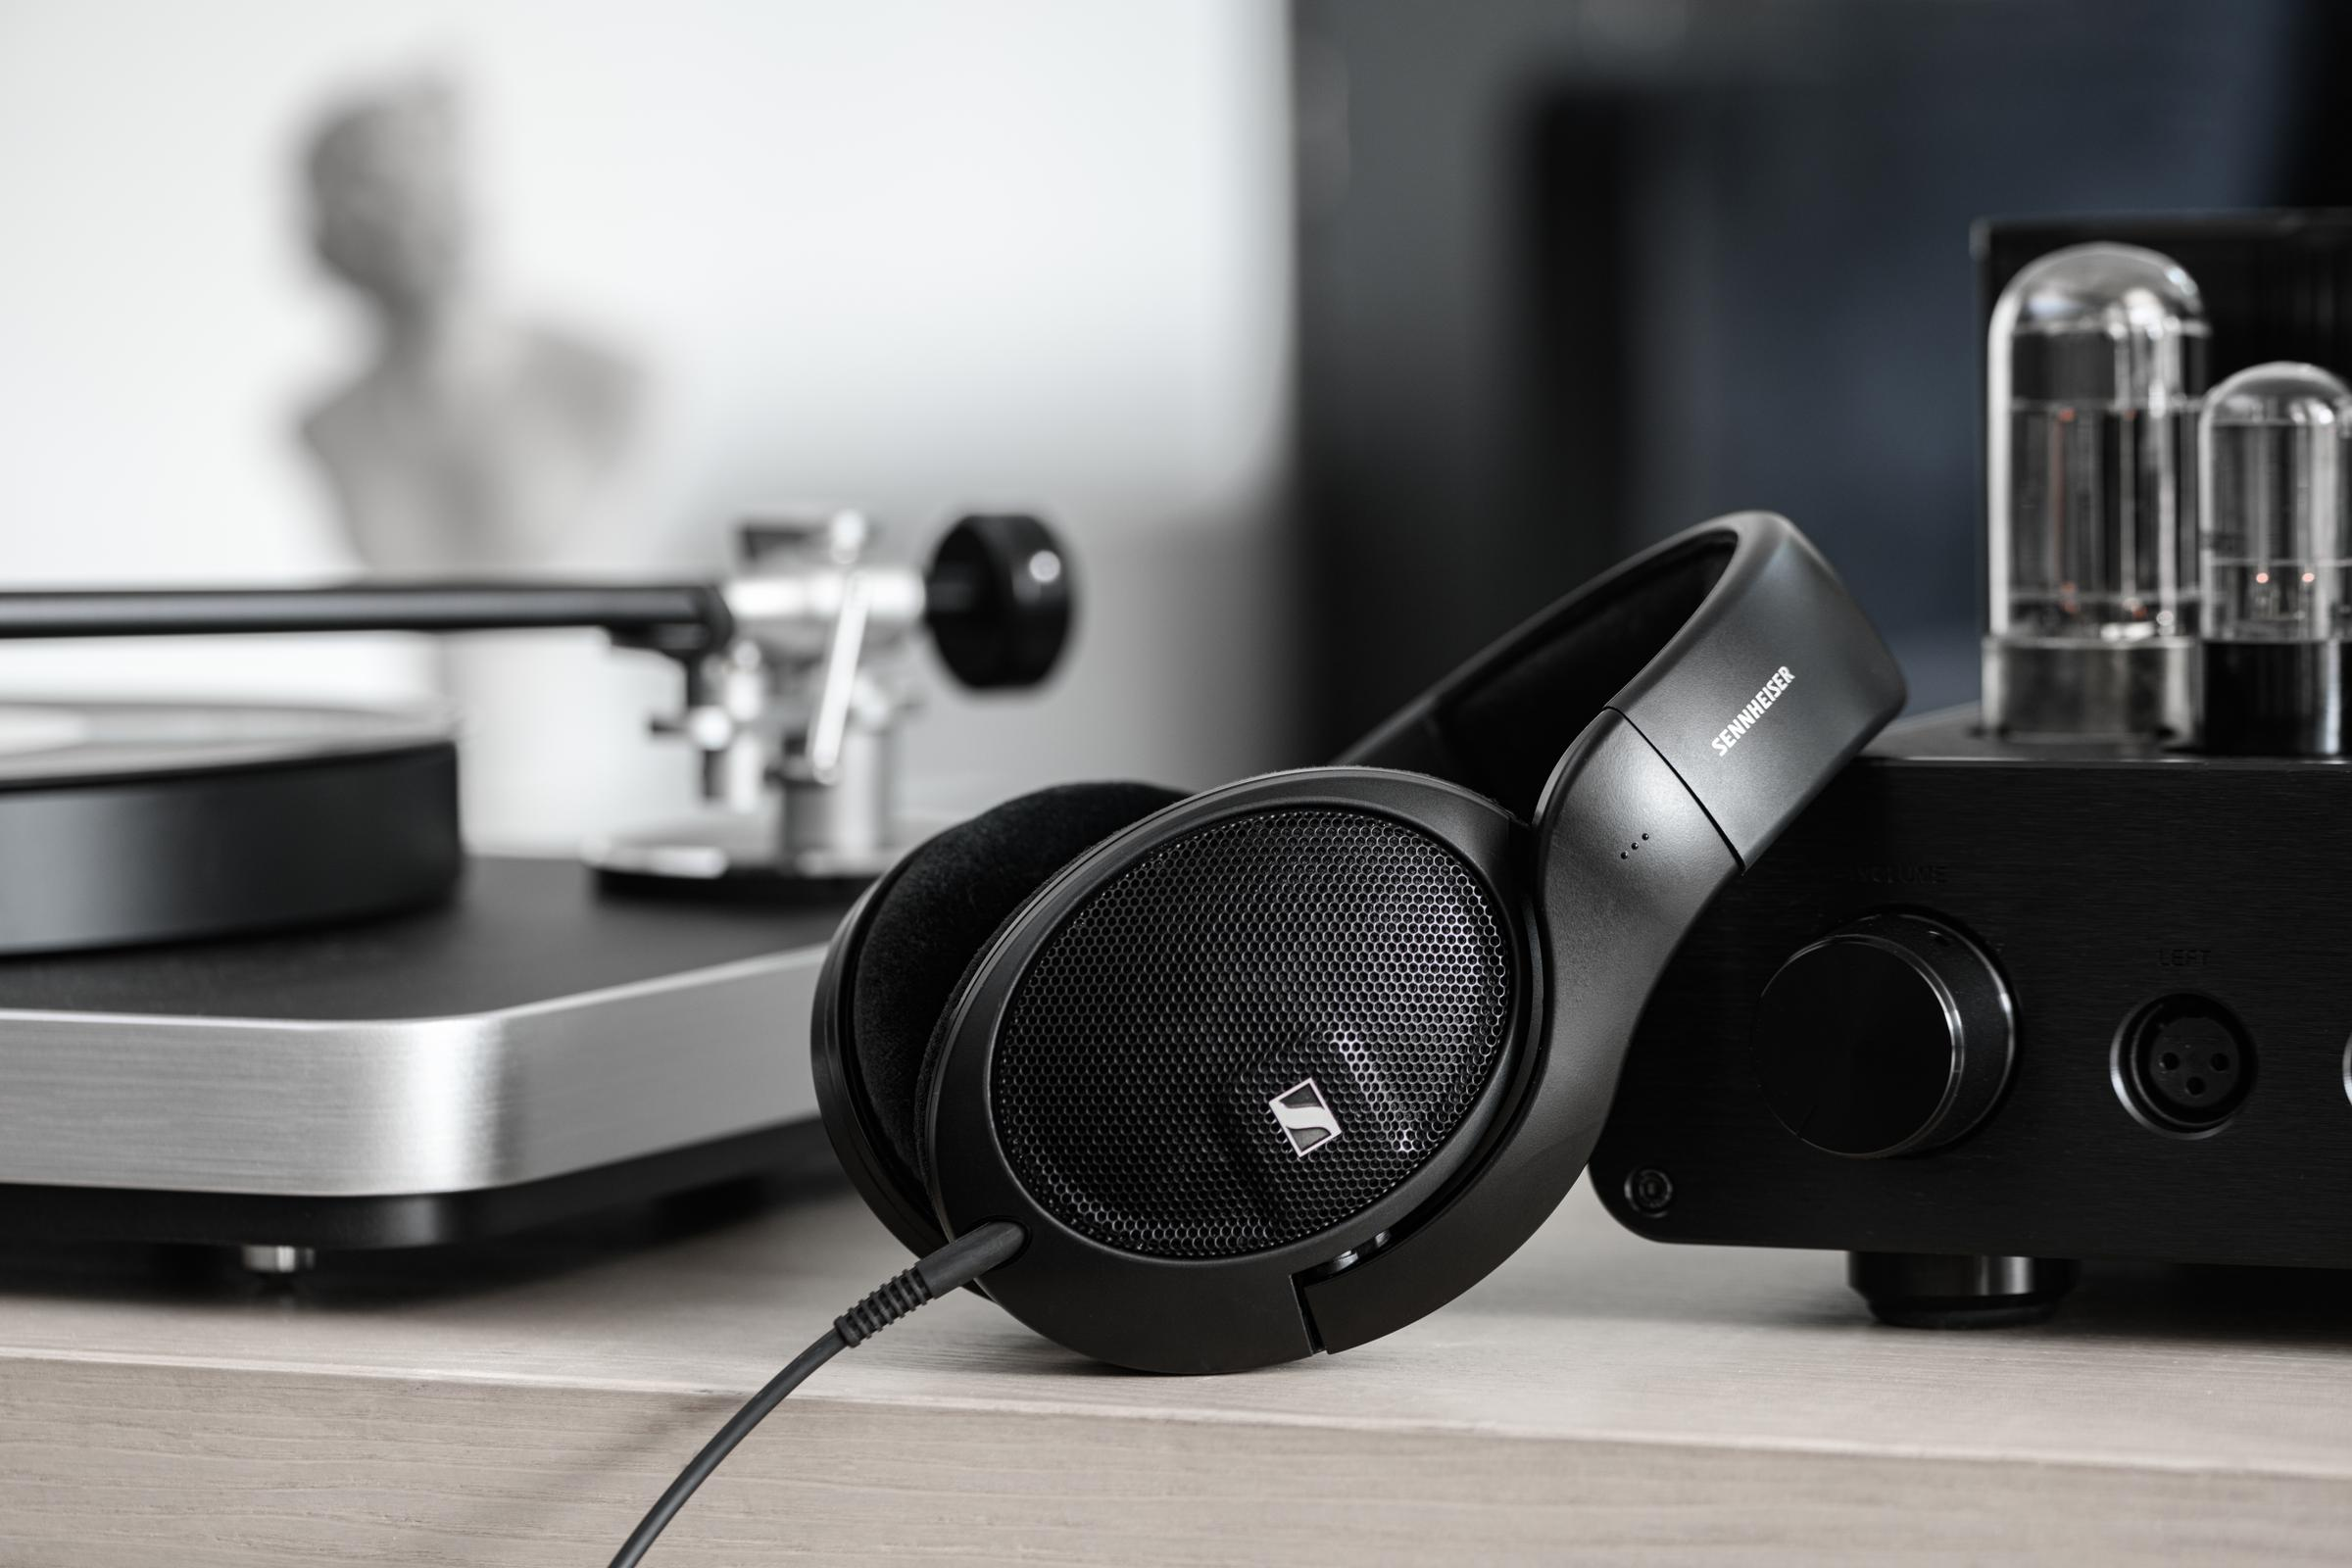 Offener Over-Ear-Kopfhörer Sennheiser HD 560S für anspruchsvolles Musikhören vorgestellt